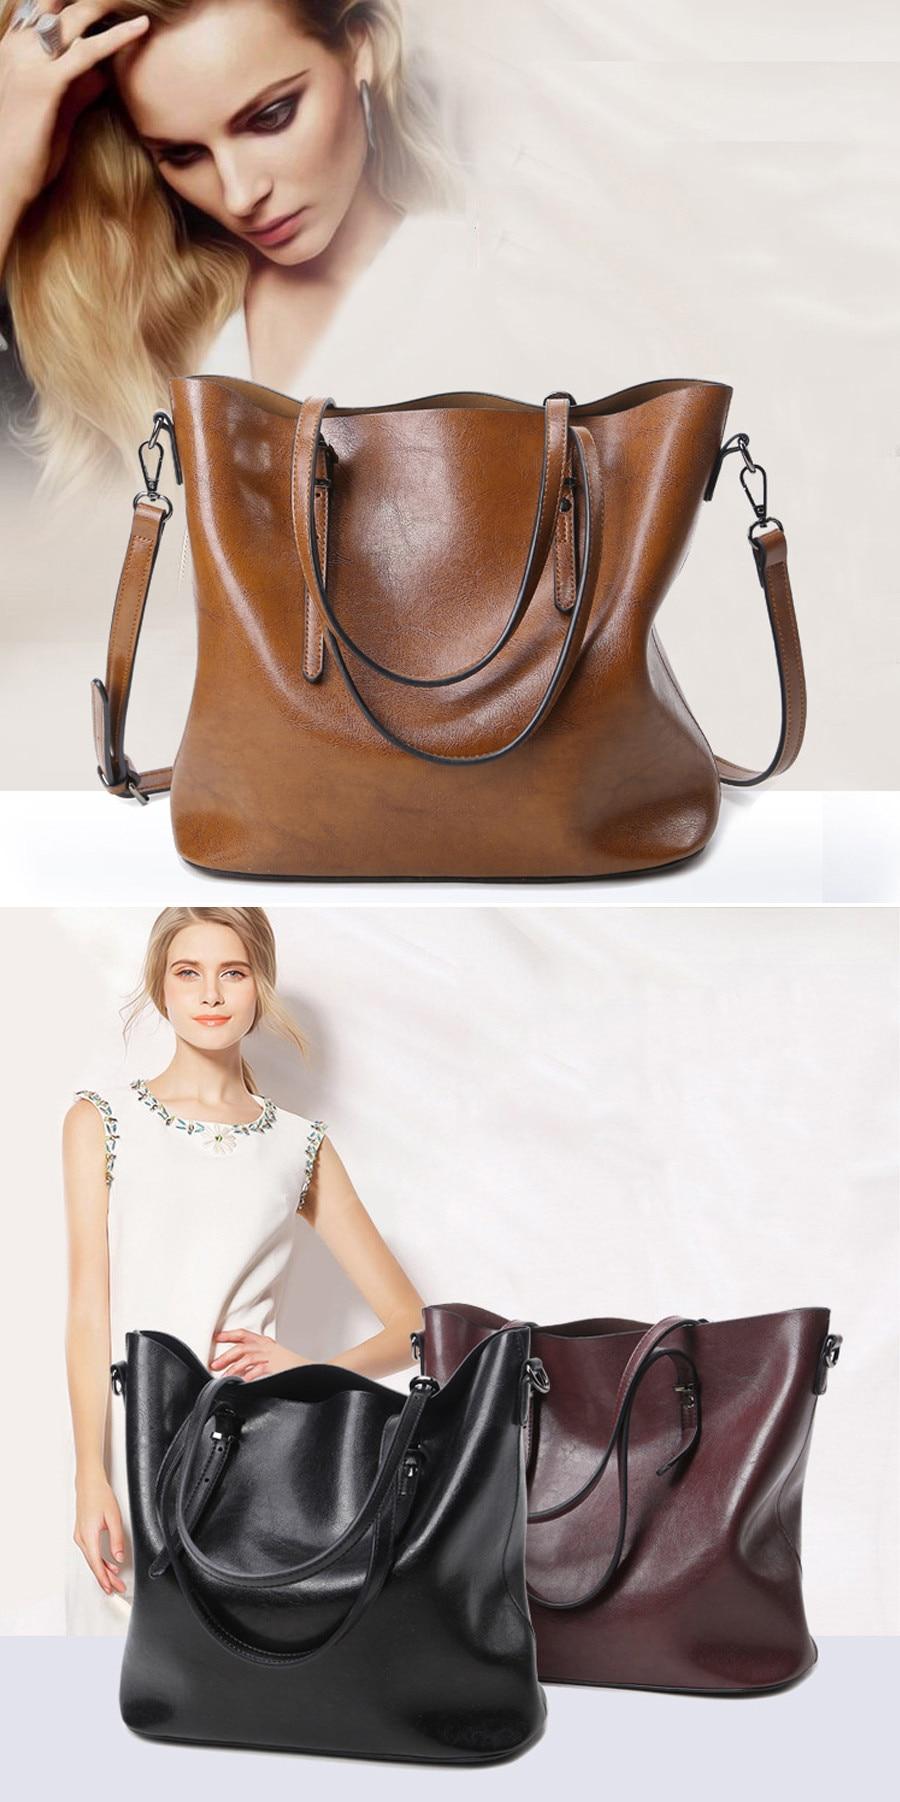 women-bag-08